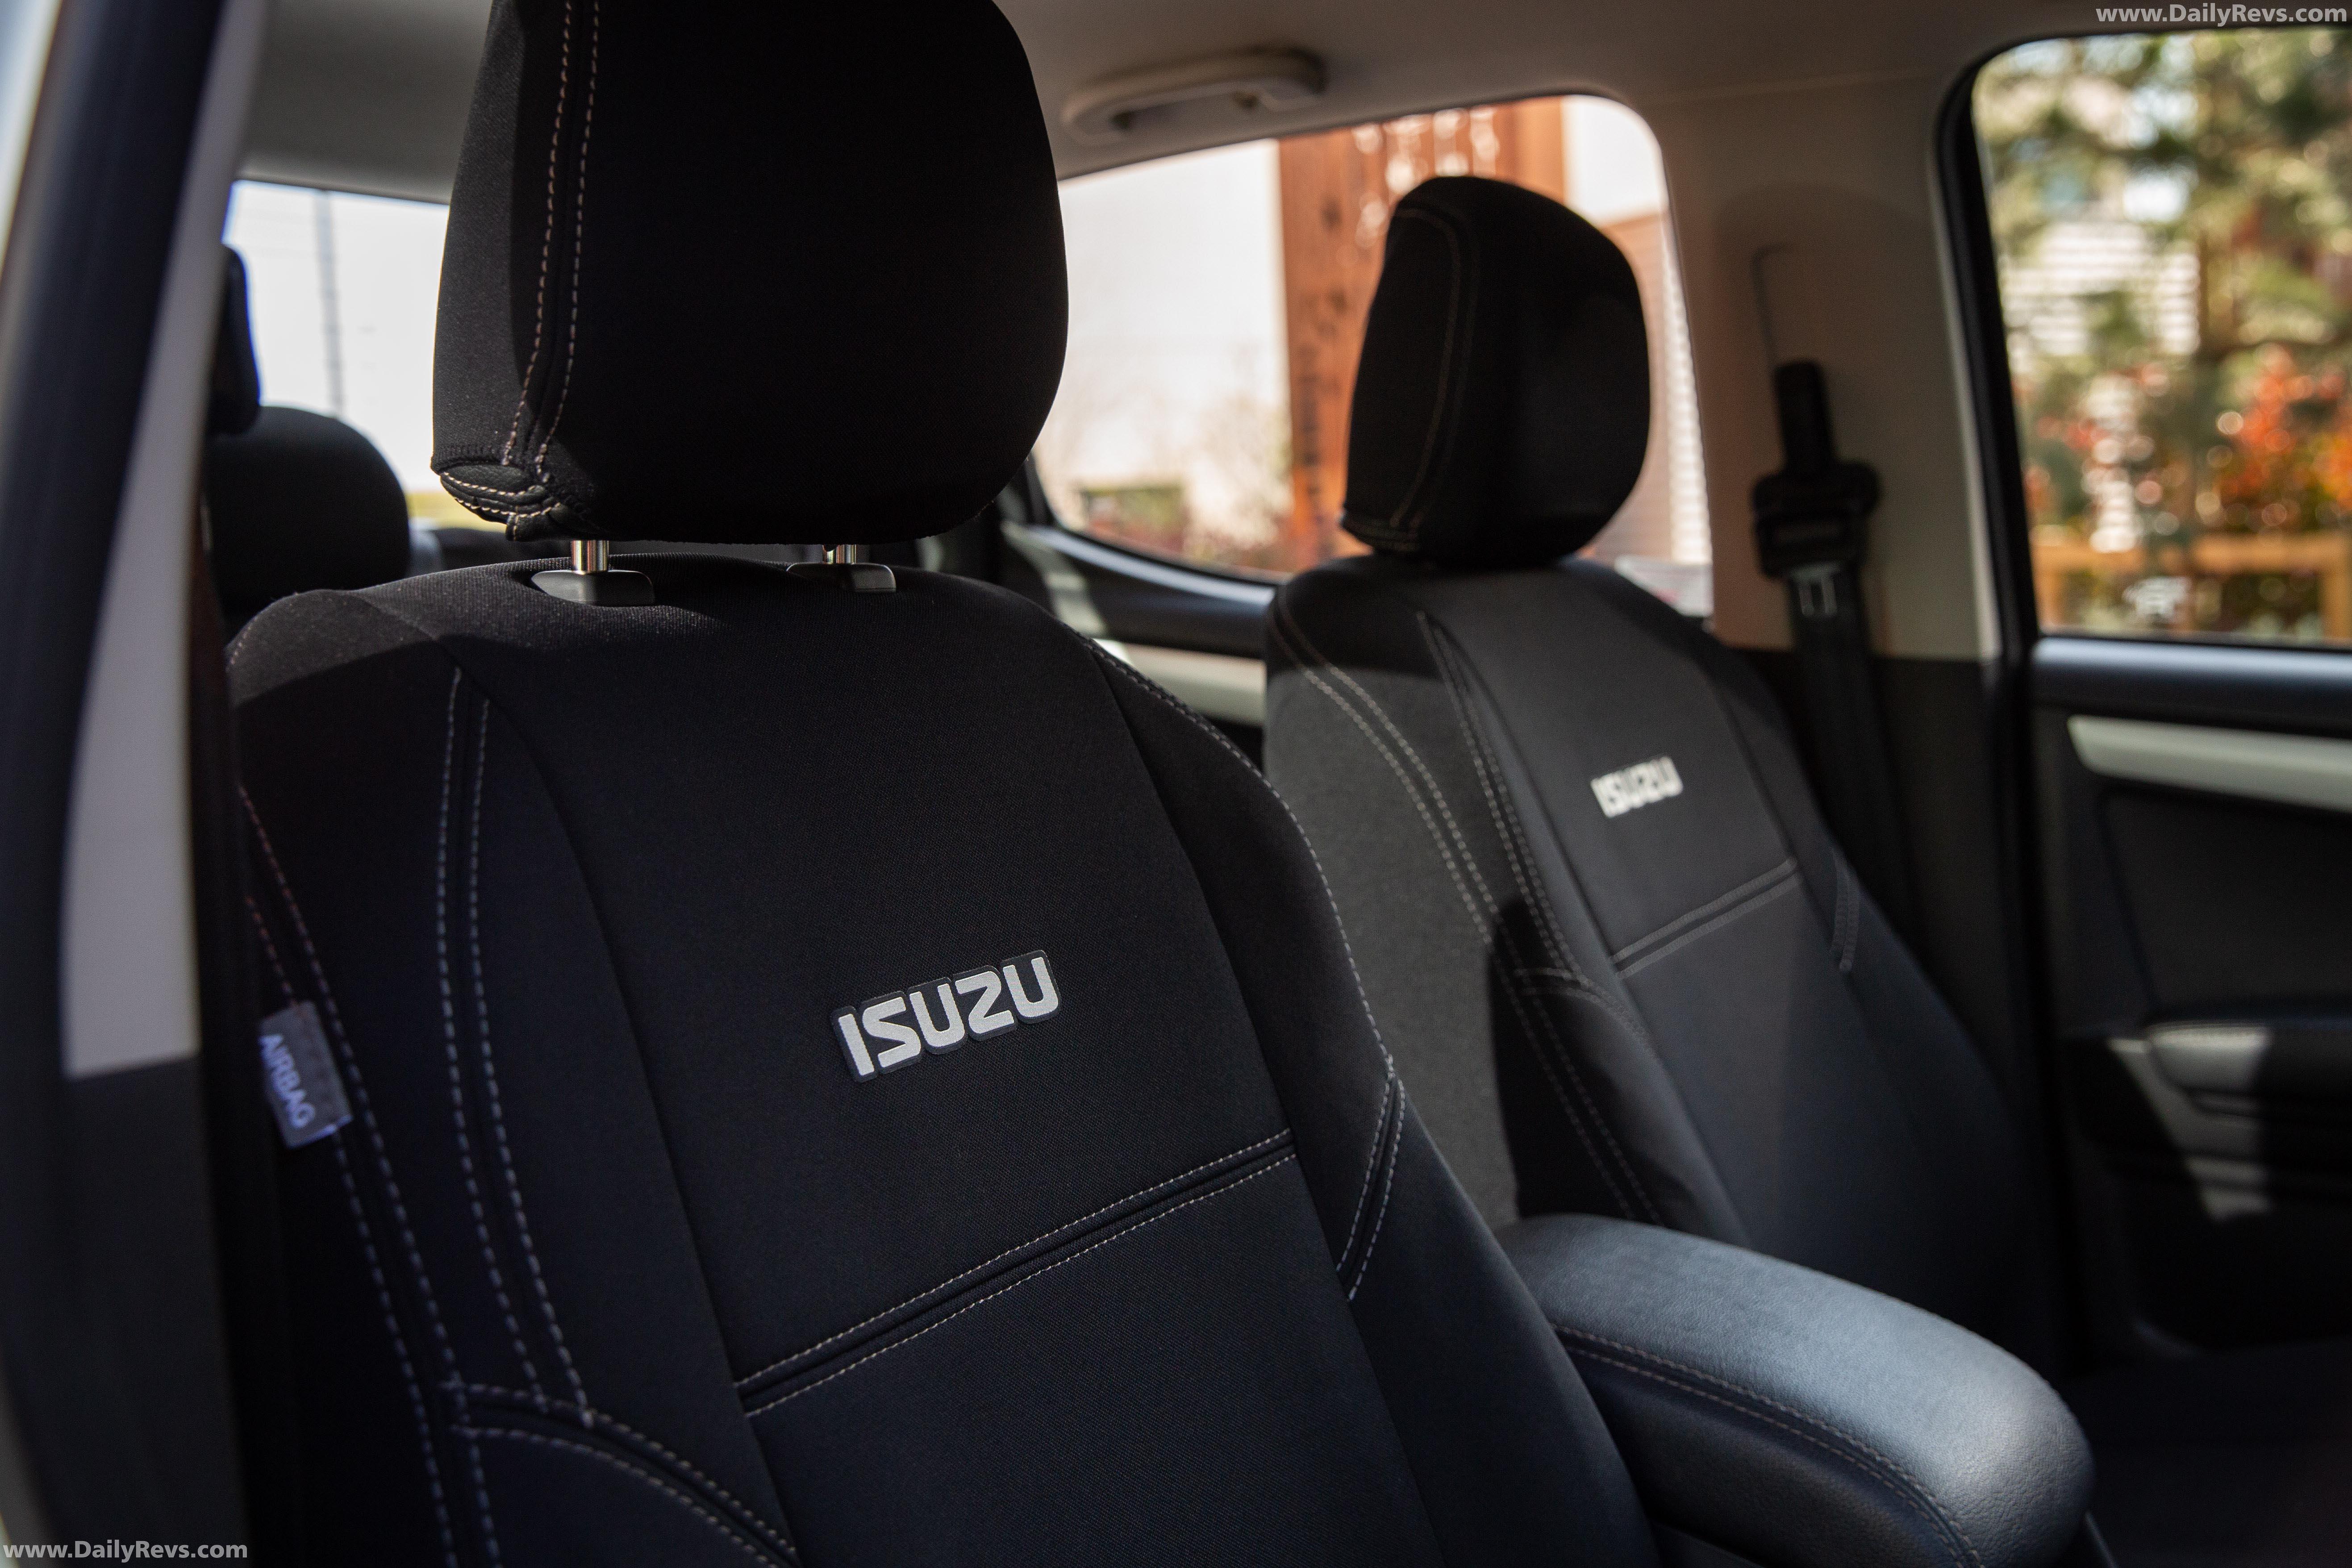 2020 Isuzu D-Max Off-Roader full